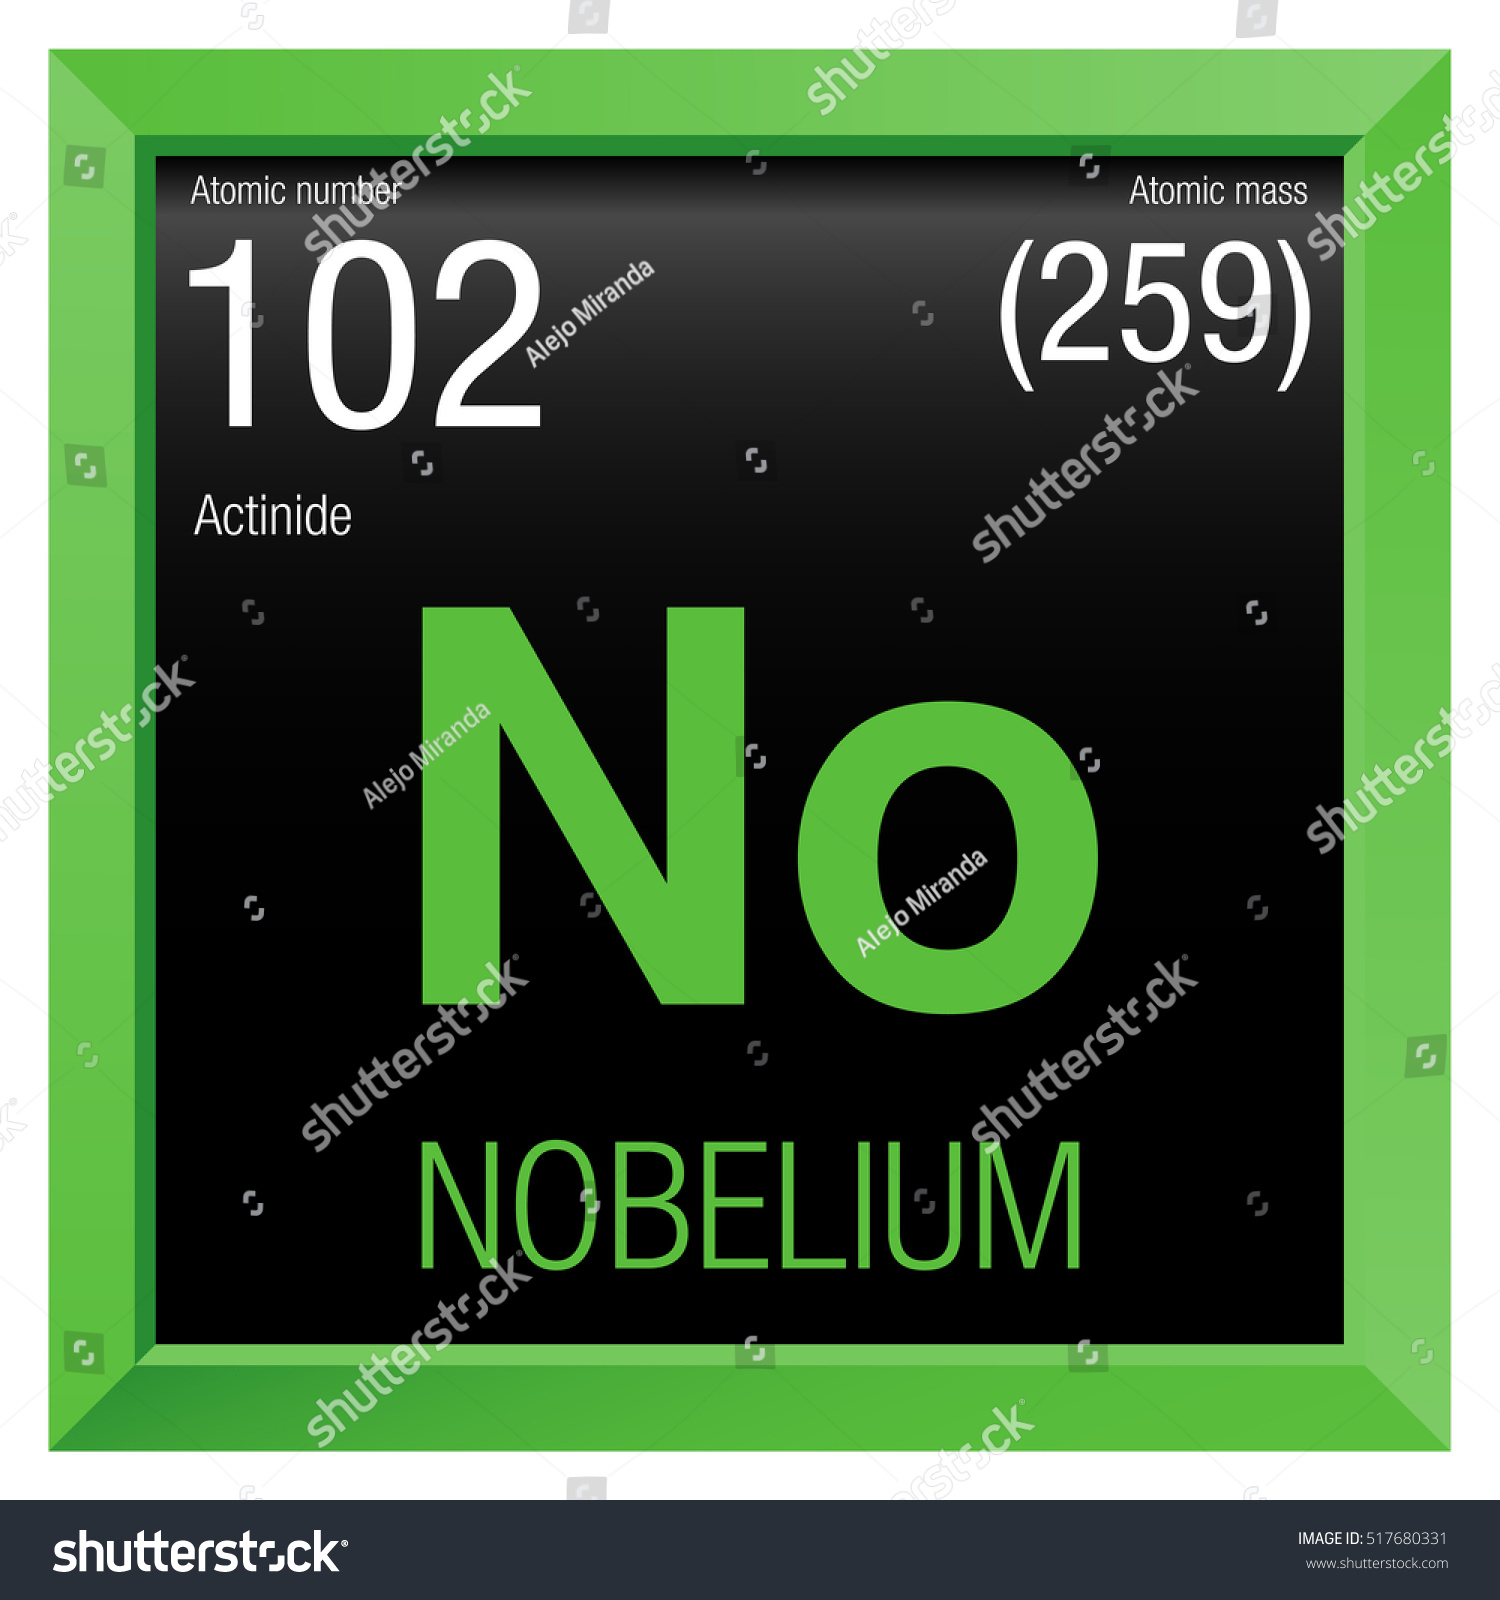 Chemical symbol for nobelium gallery symbol and sign ideas nobelium symbol element number 102 periodic stock vector 517680331 nobelium symbol element number 102 of the buycottarizona